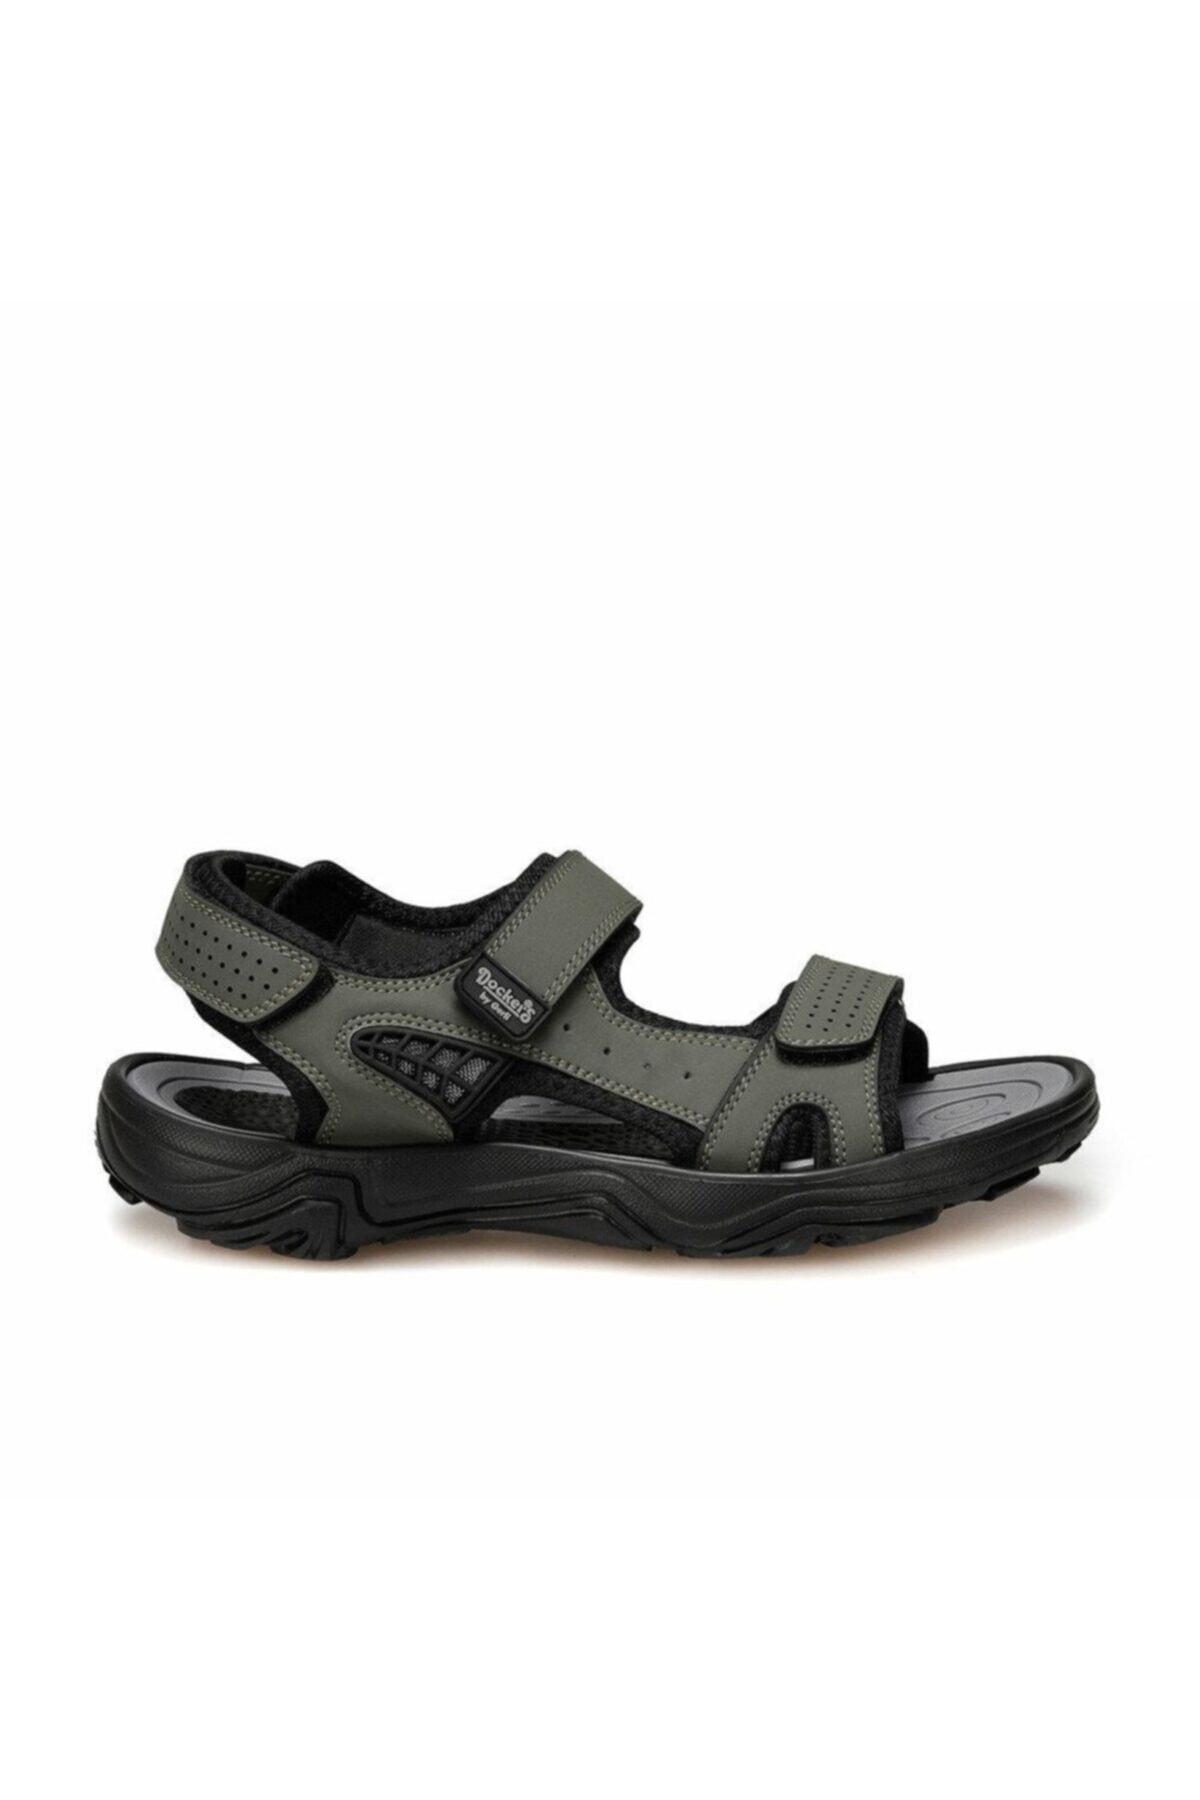 Dockers Erkek Haki Confort Casual Spor Sandalet 228653 1